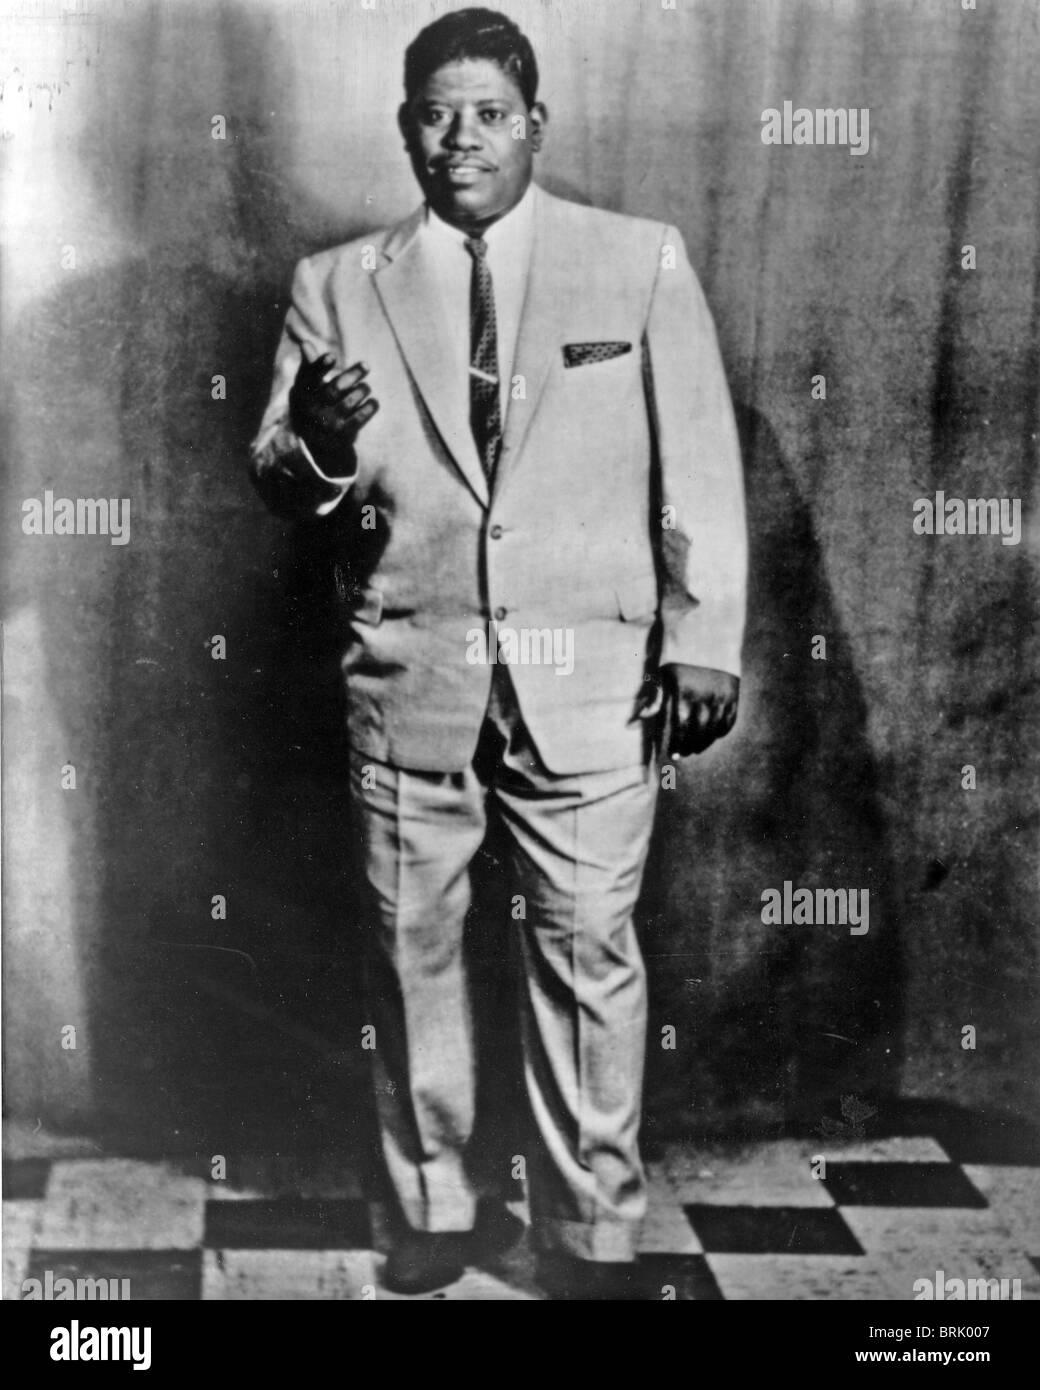 CHRIS KENNER (1929-76) US R&B  singer - Stock Image